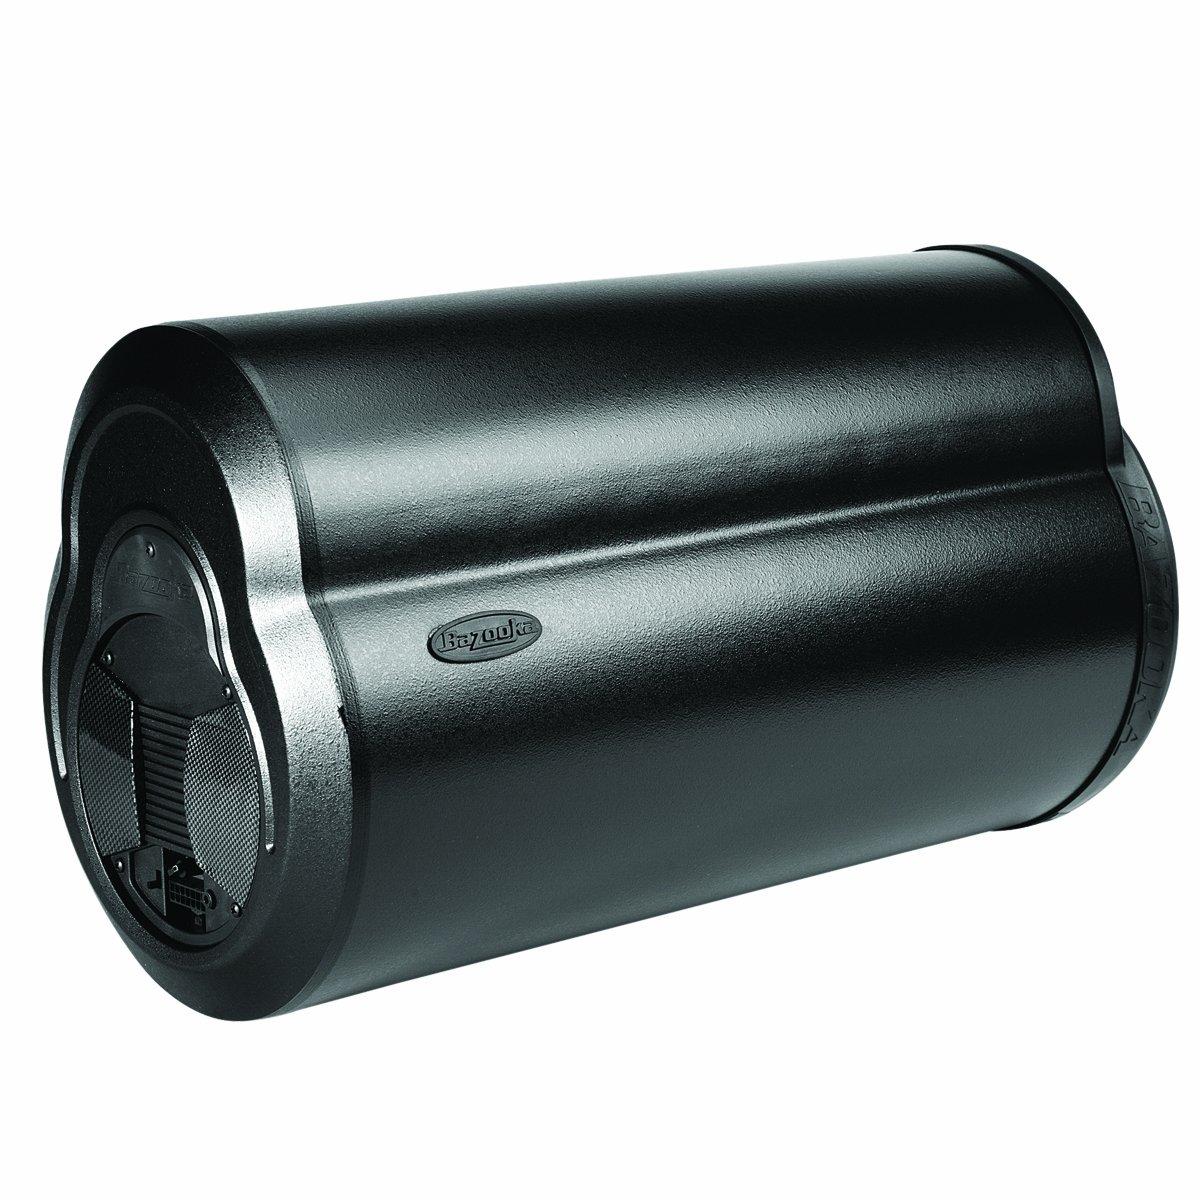 Bazooka Bta10100fhc 100 W Rms - 200 W Pmpo Woofer - 2 Ohm (bta10100fhc)